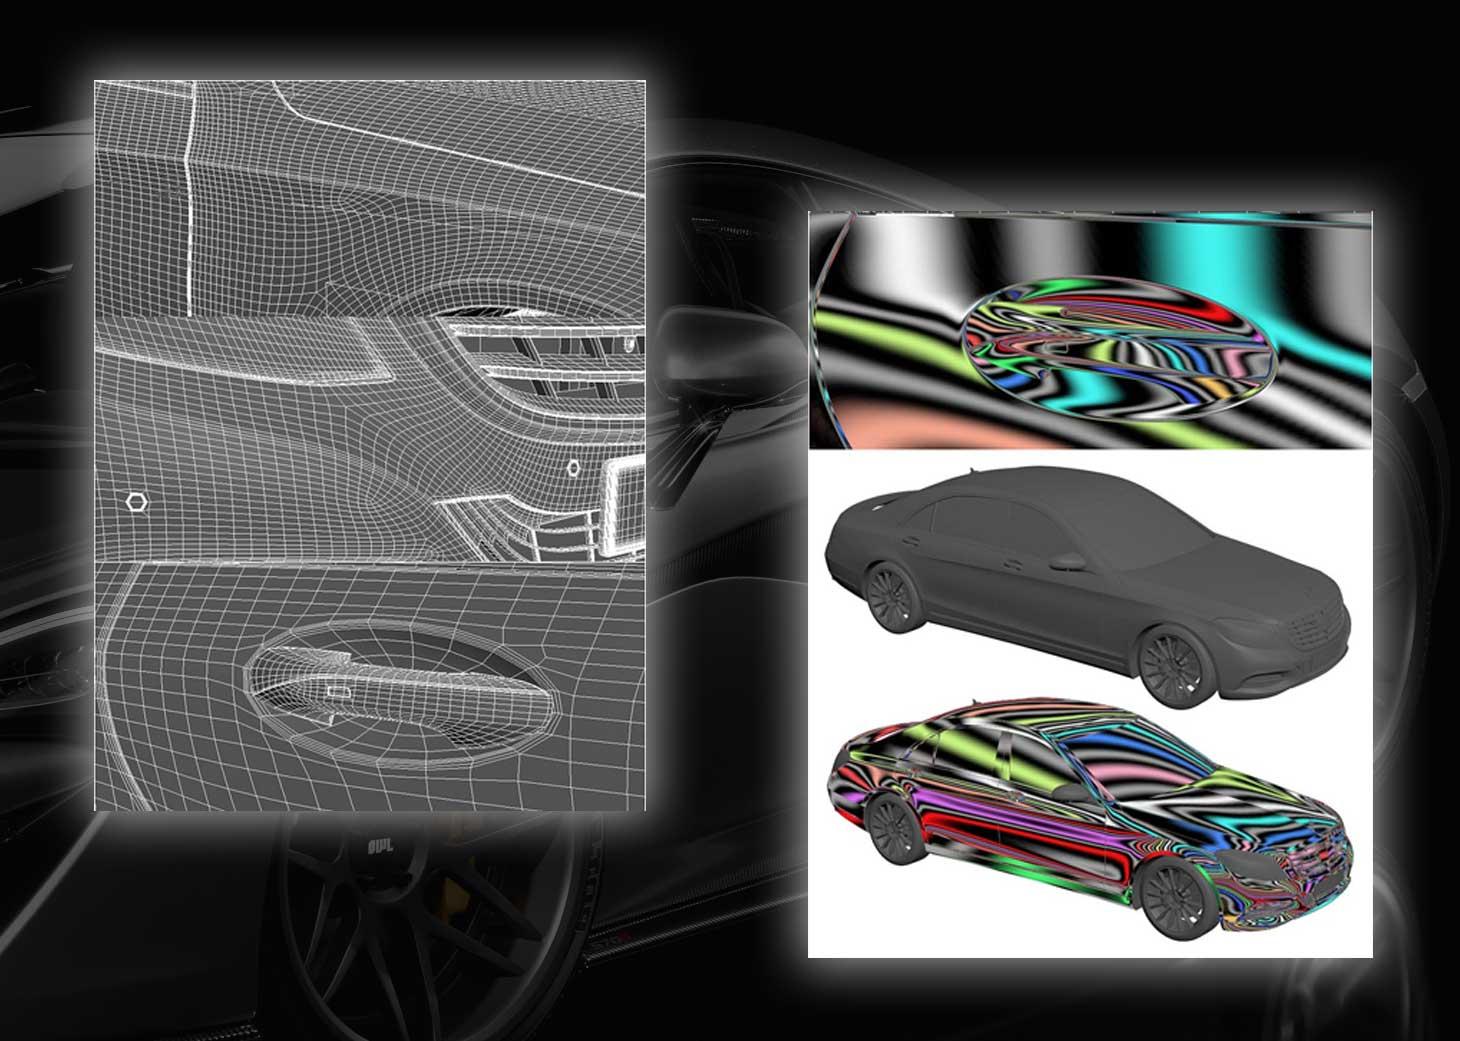 modeling using polygons car 3ds max maya21 - مدلسازی خودرو در تری دی مکس